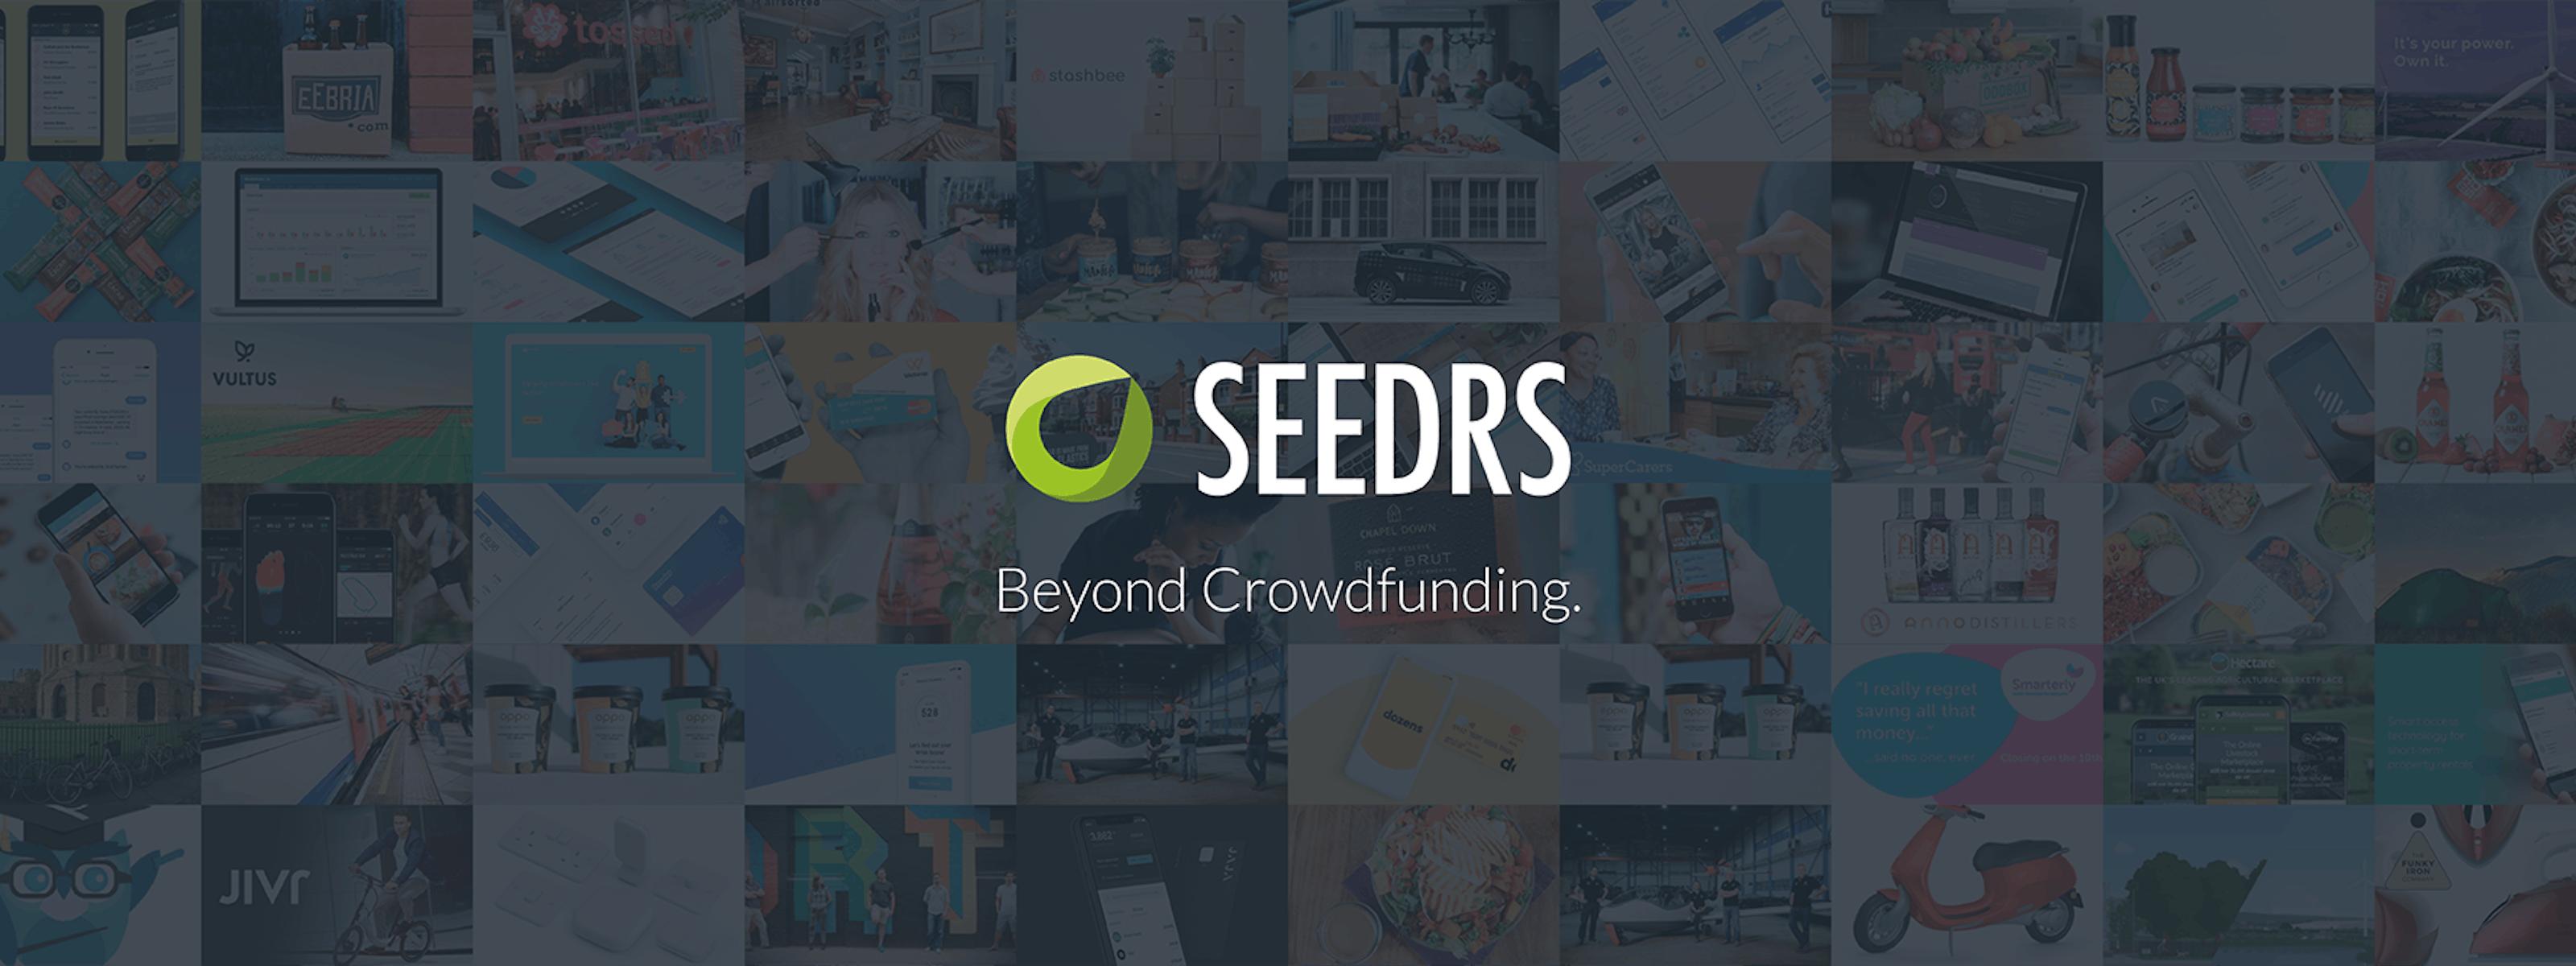 Seedrs hero image